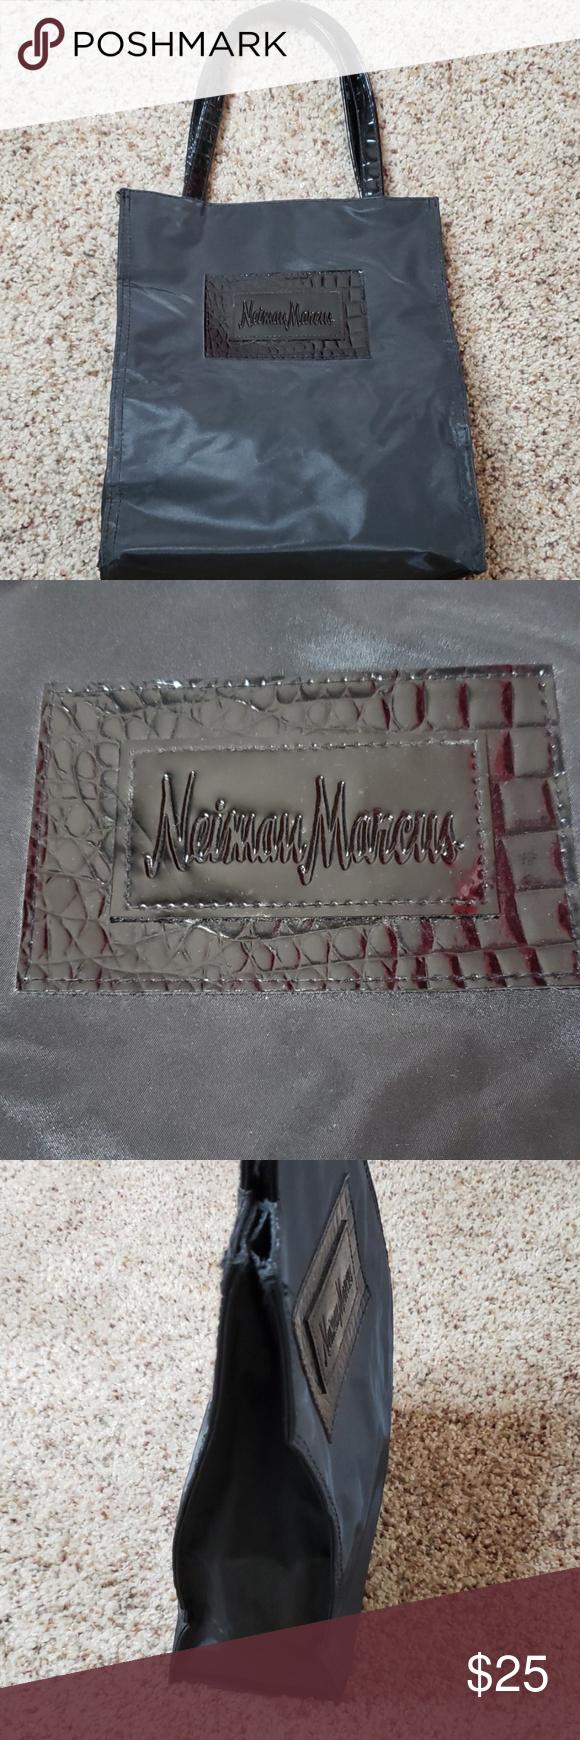 Neiman Marcus Pop Up Book 100th Anniversary Neiman Marcus 0400130027623 Amazon Com Books Pop Up Book Books Neiman Marcus